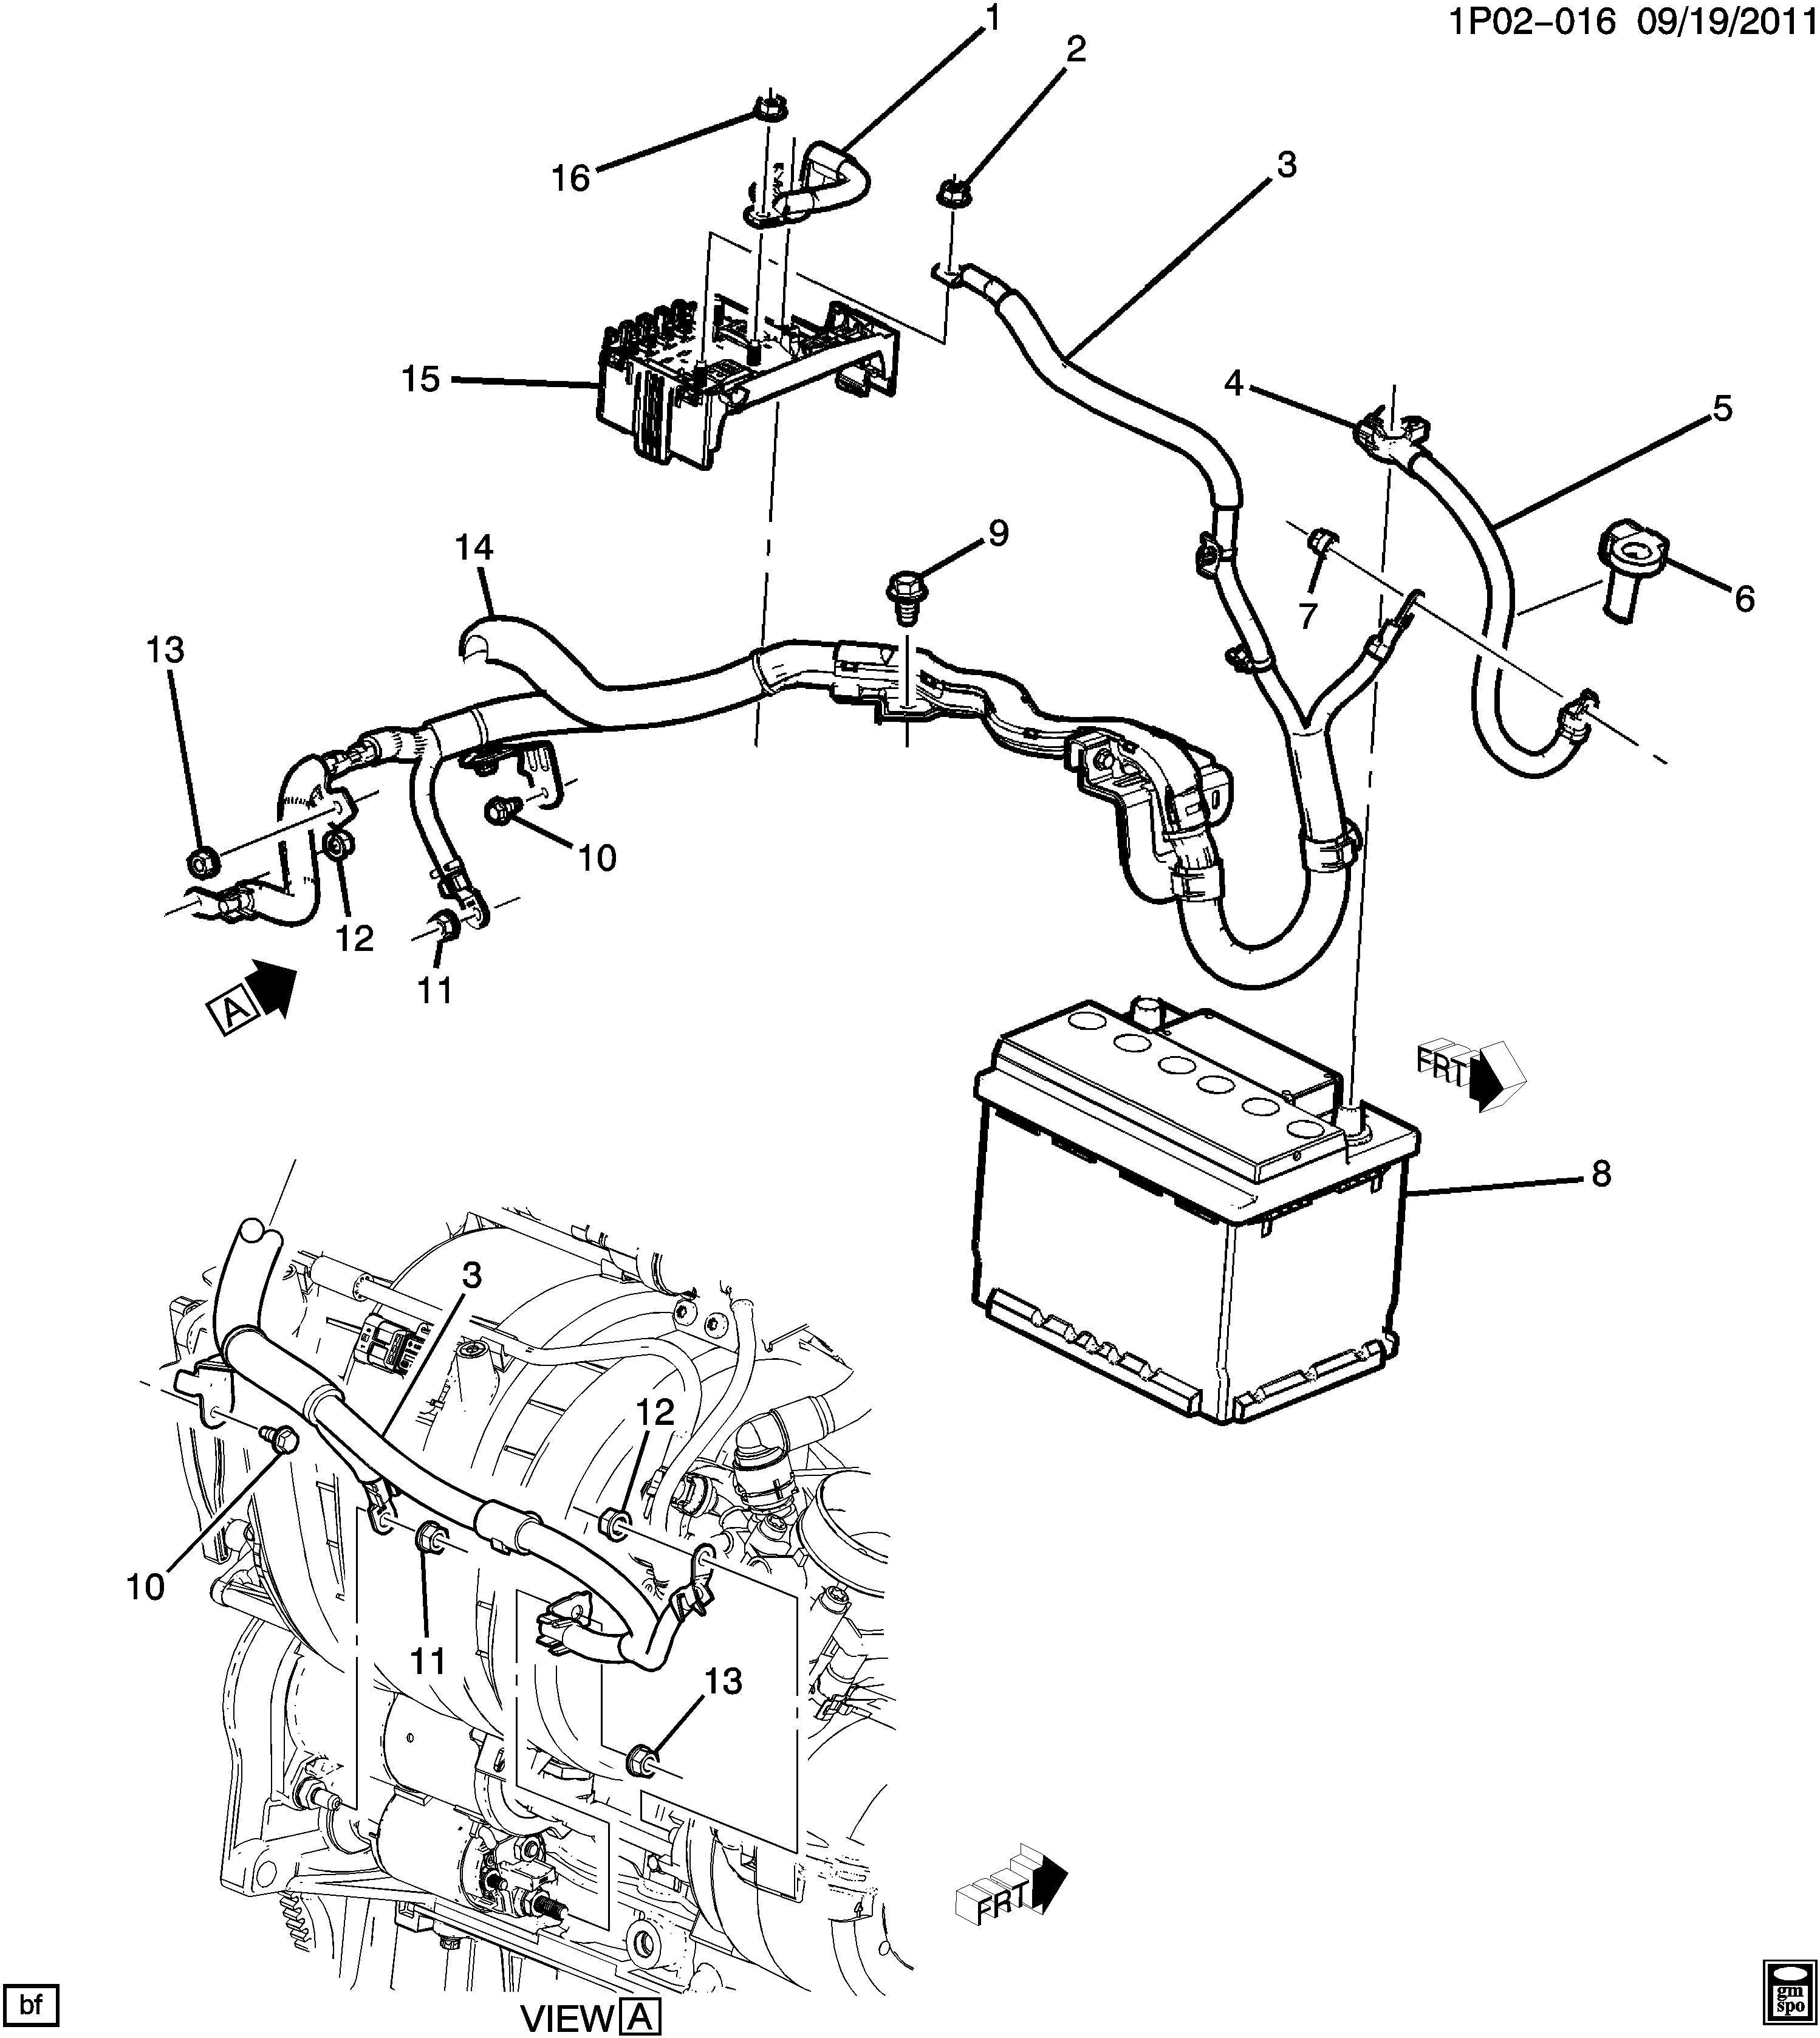 Diagram Dual Battery Wiring Diagram Chevy Full Version